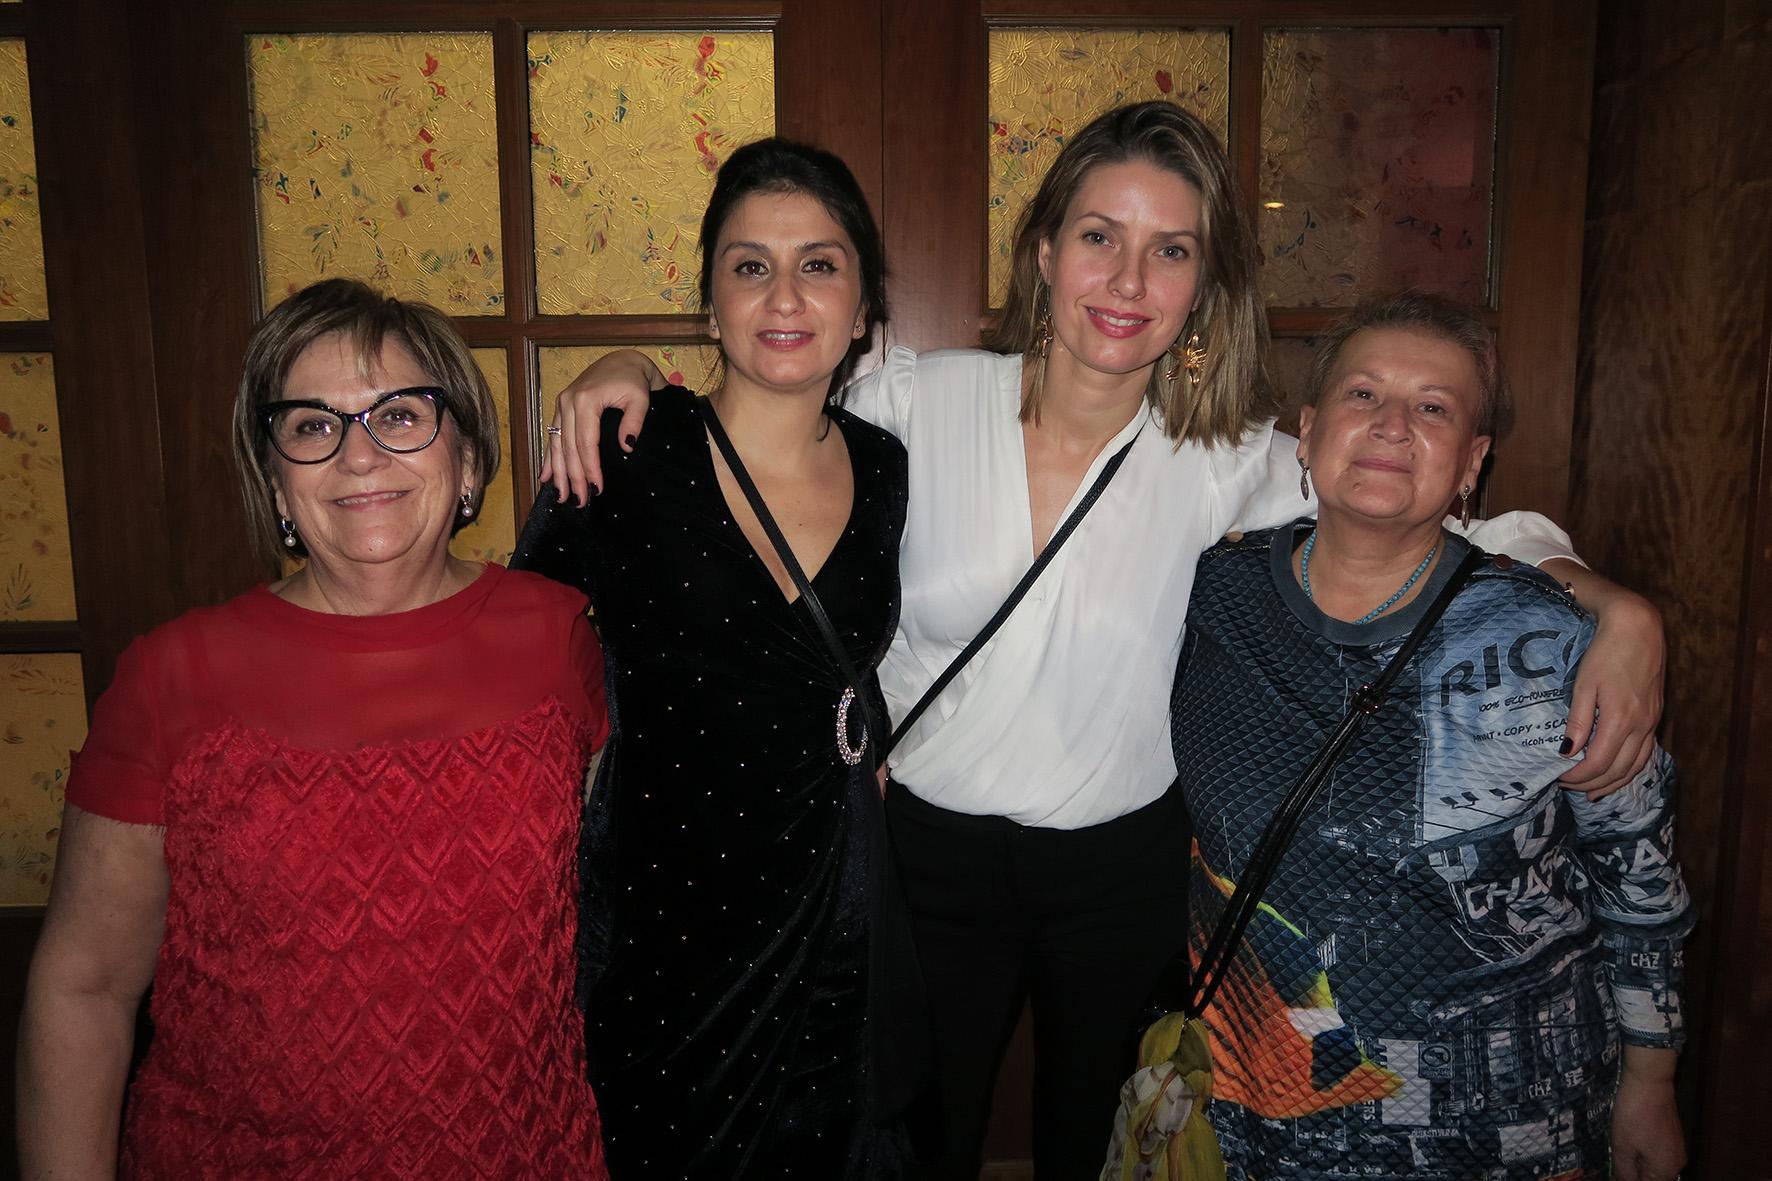 Ópticos-optometristas gallegos en Santa Otilia 2019